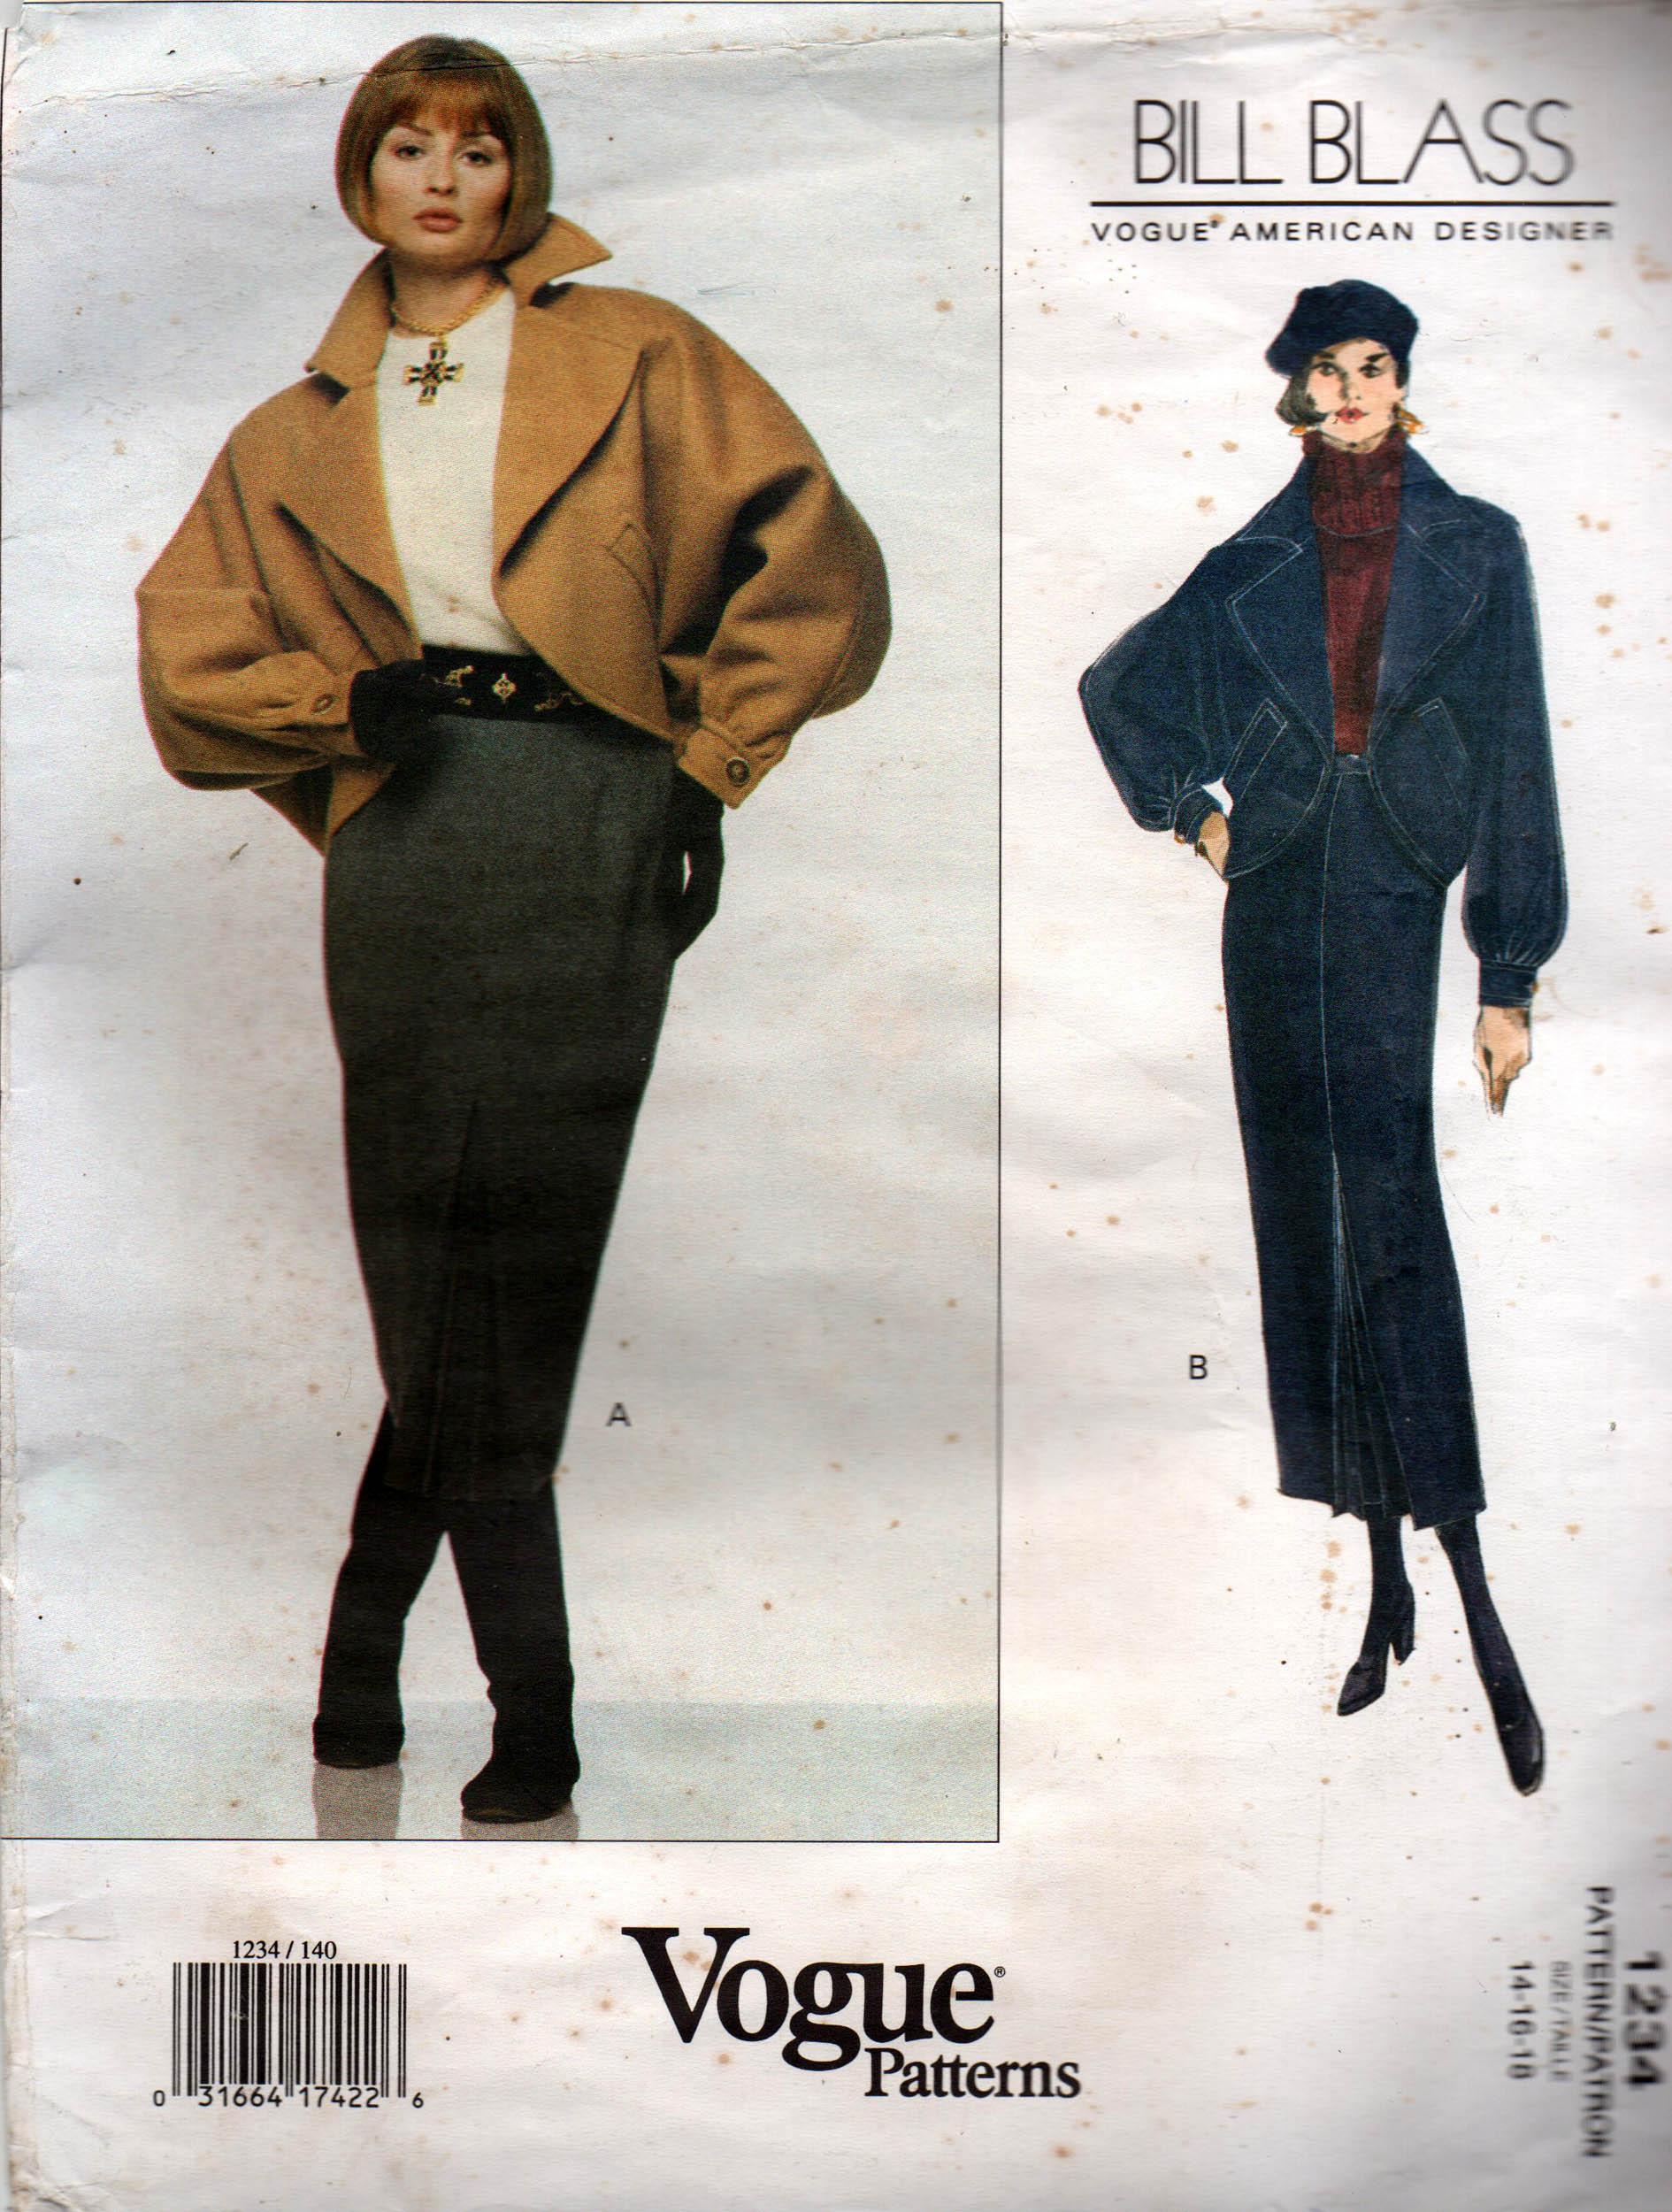 Vogue 1234 B